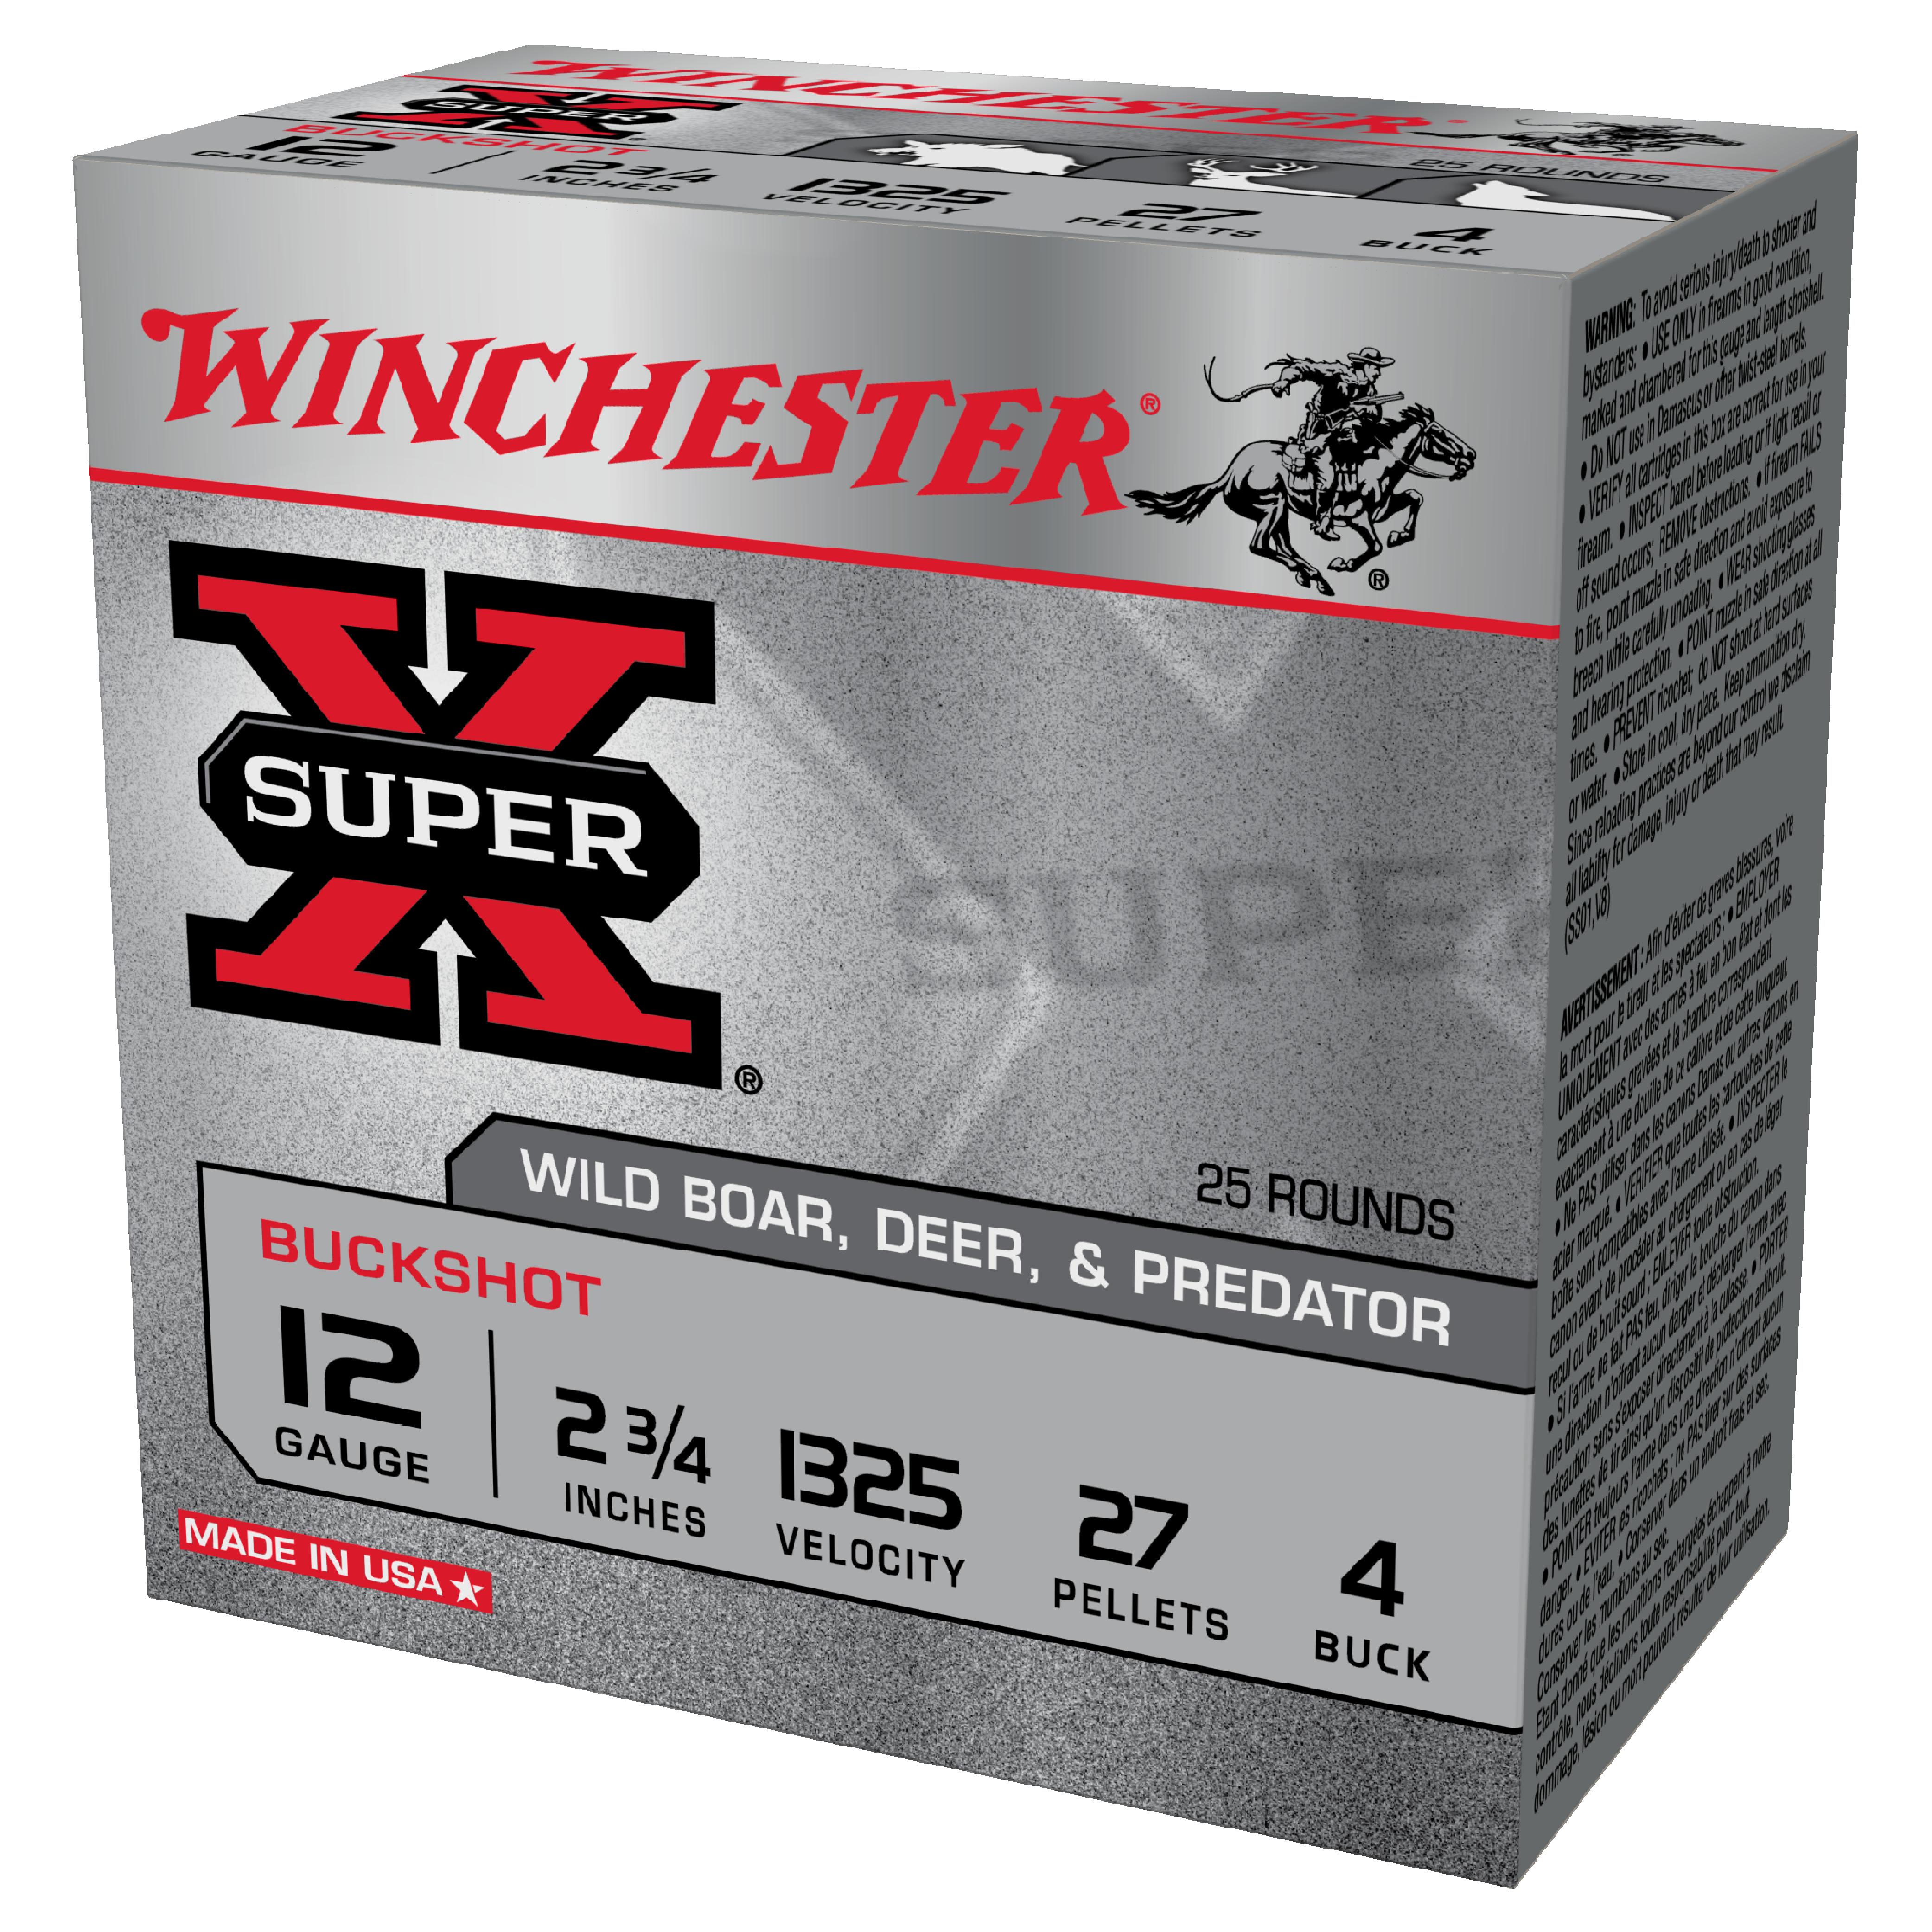 Winchester Buckshot 12G 4Buck 2-3/4